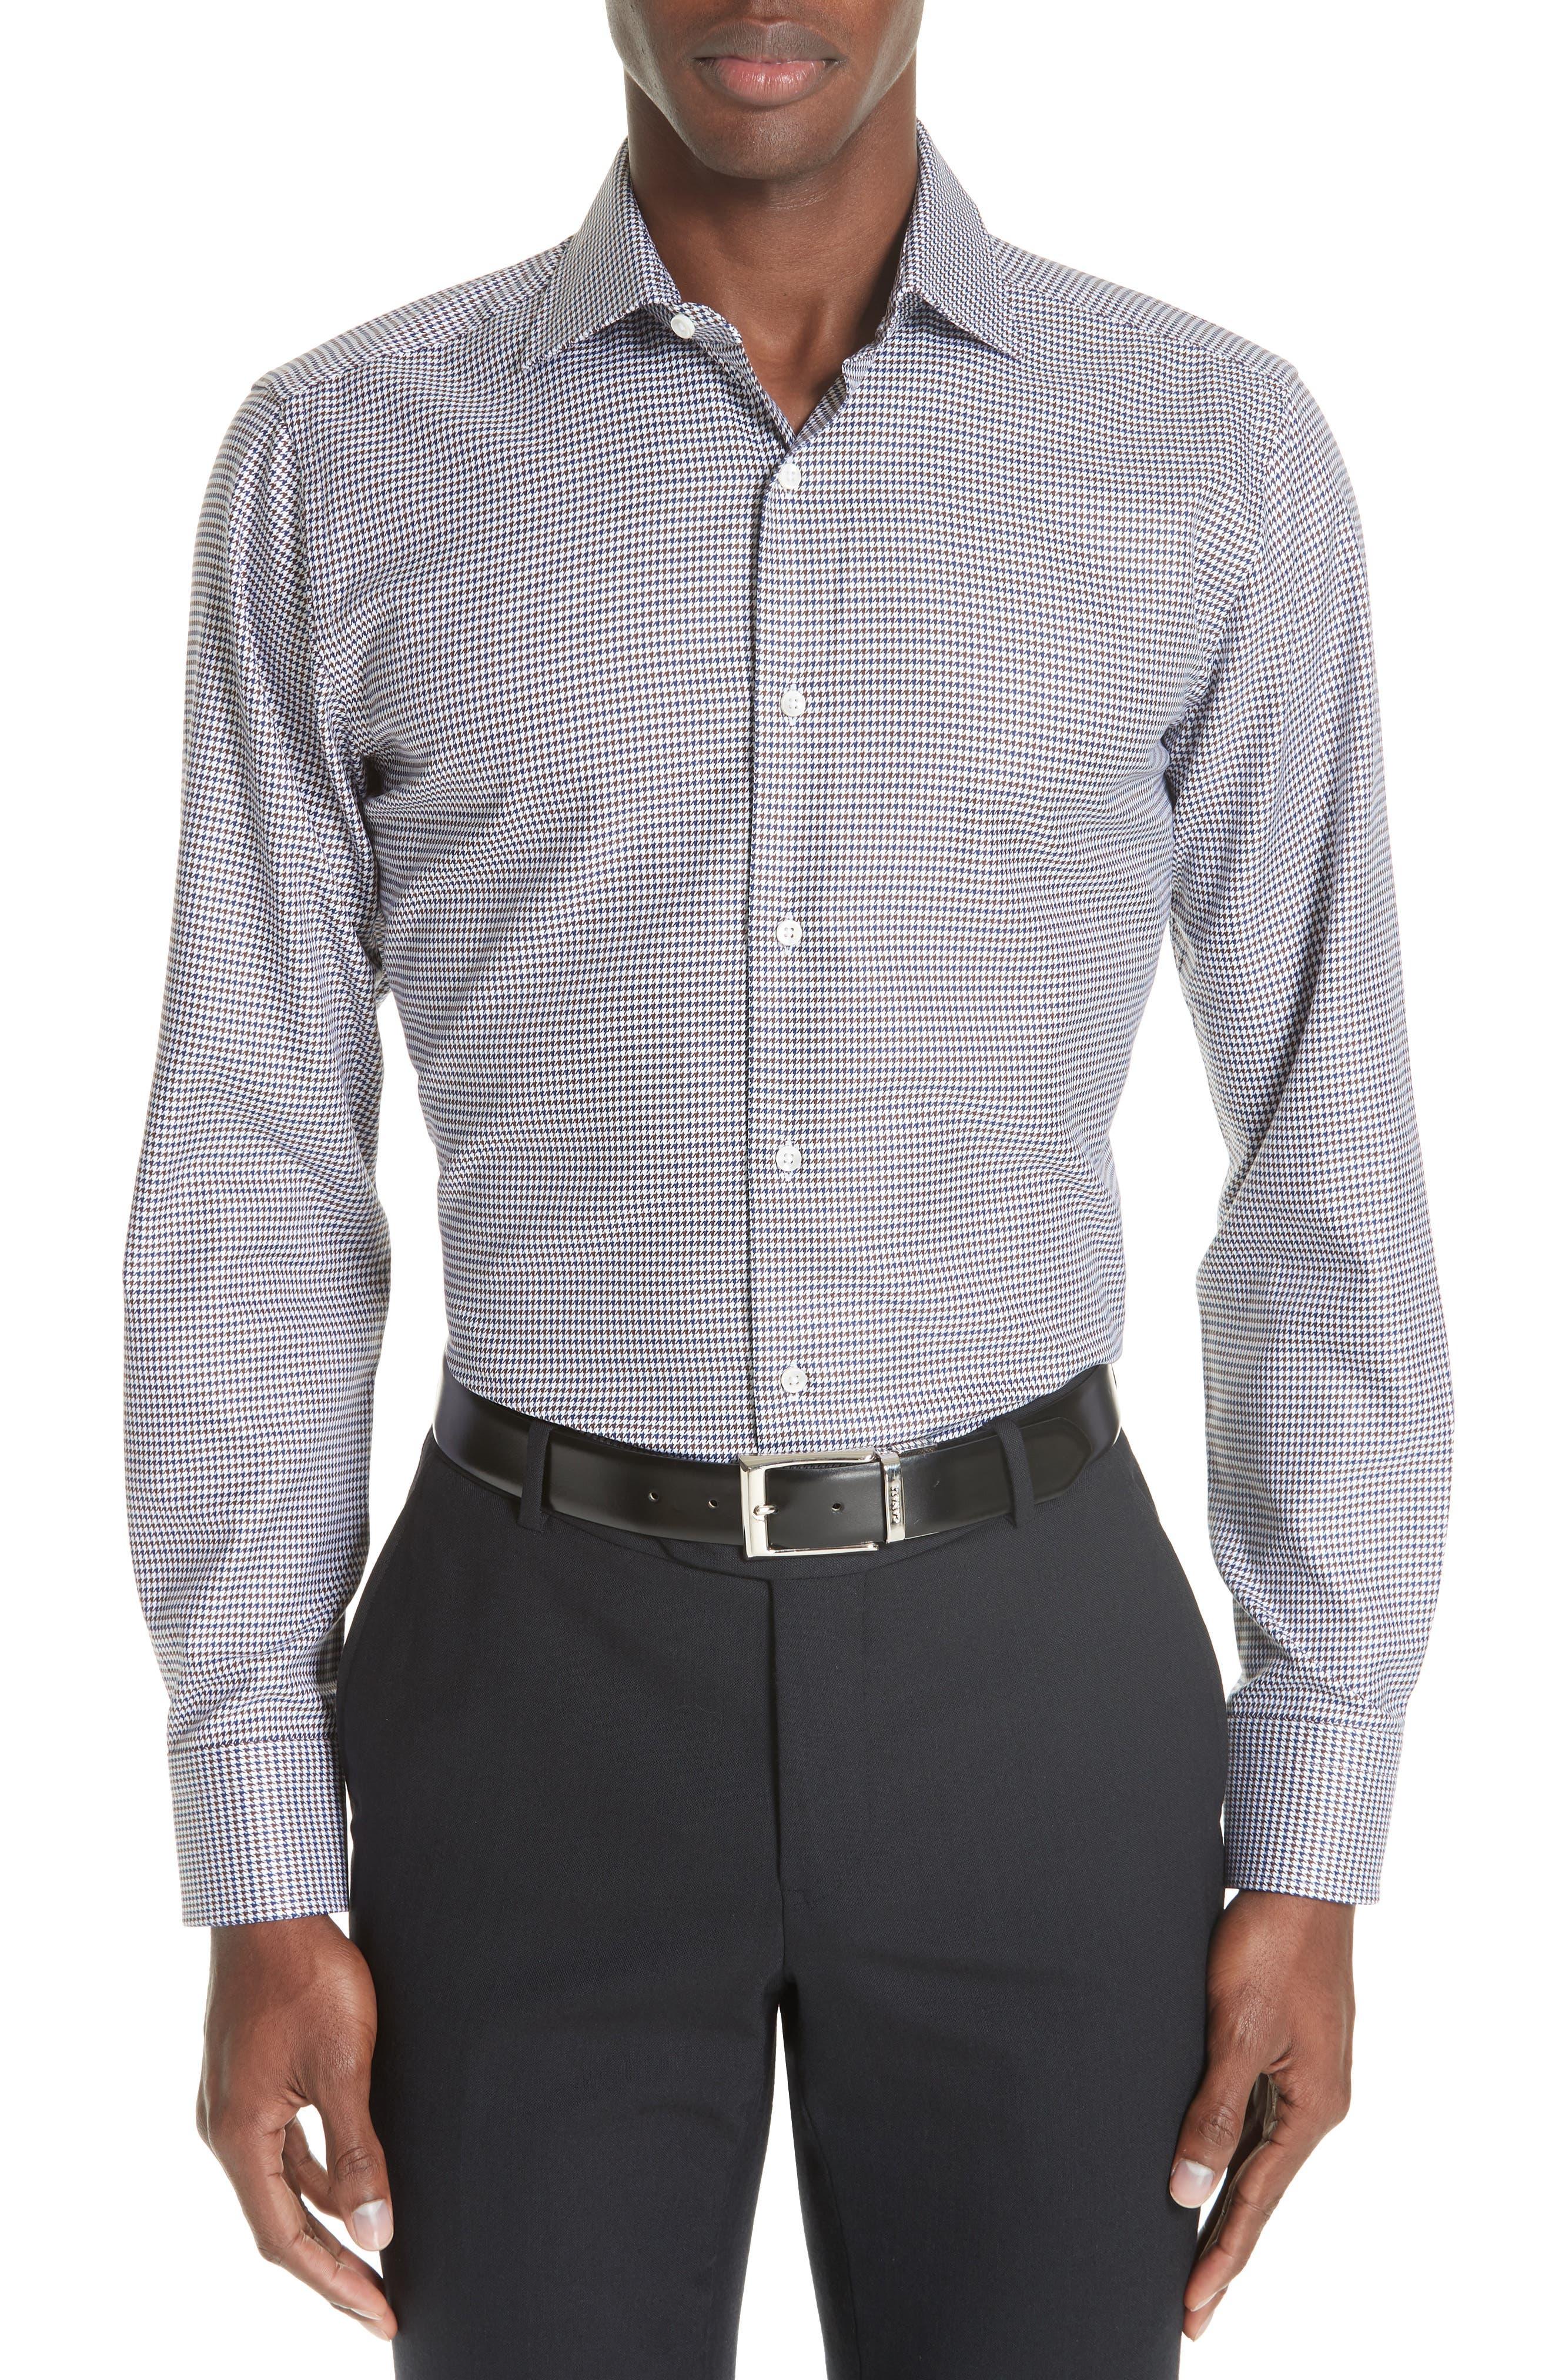 Regular Fit Houndstooth Dress Shirt,                             Main thumbnail 1, color,                             NAVY/ BROWN